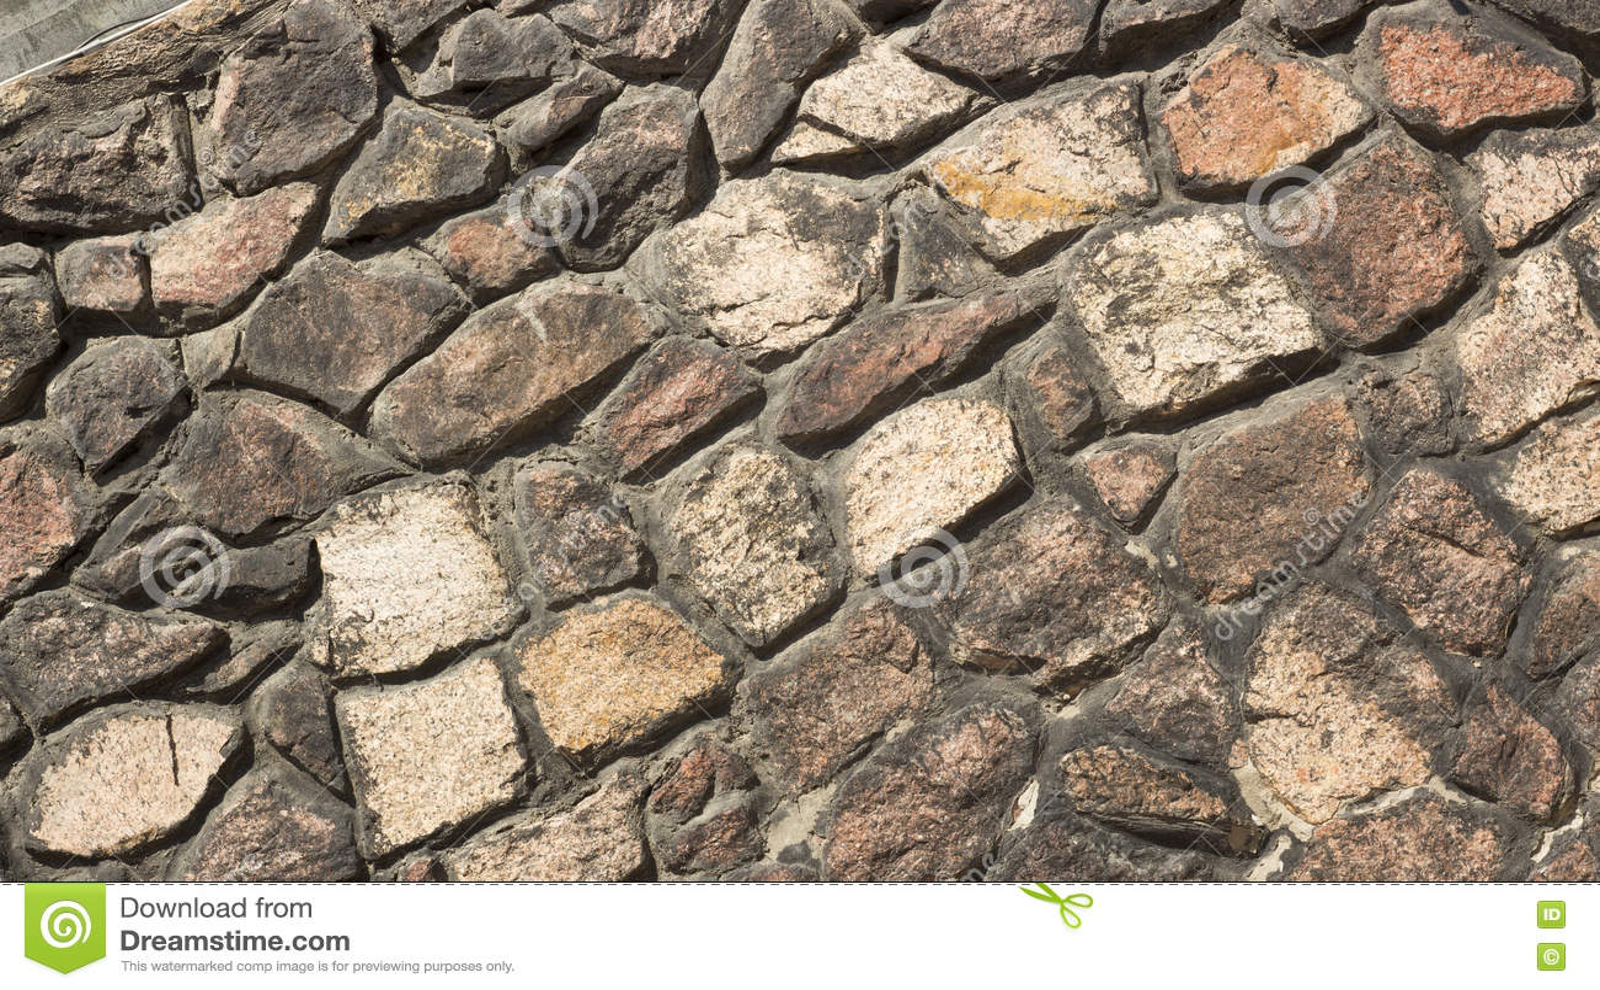 Free Images : rock, light, structure, texture, building ...   Ancient Rubble Stone